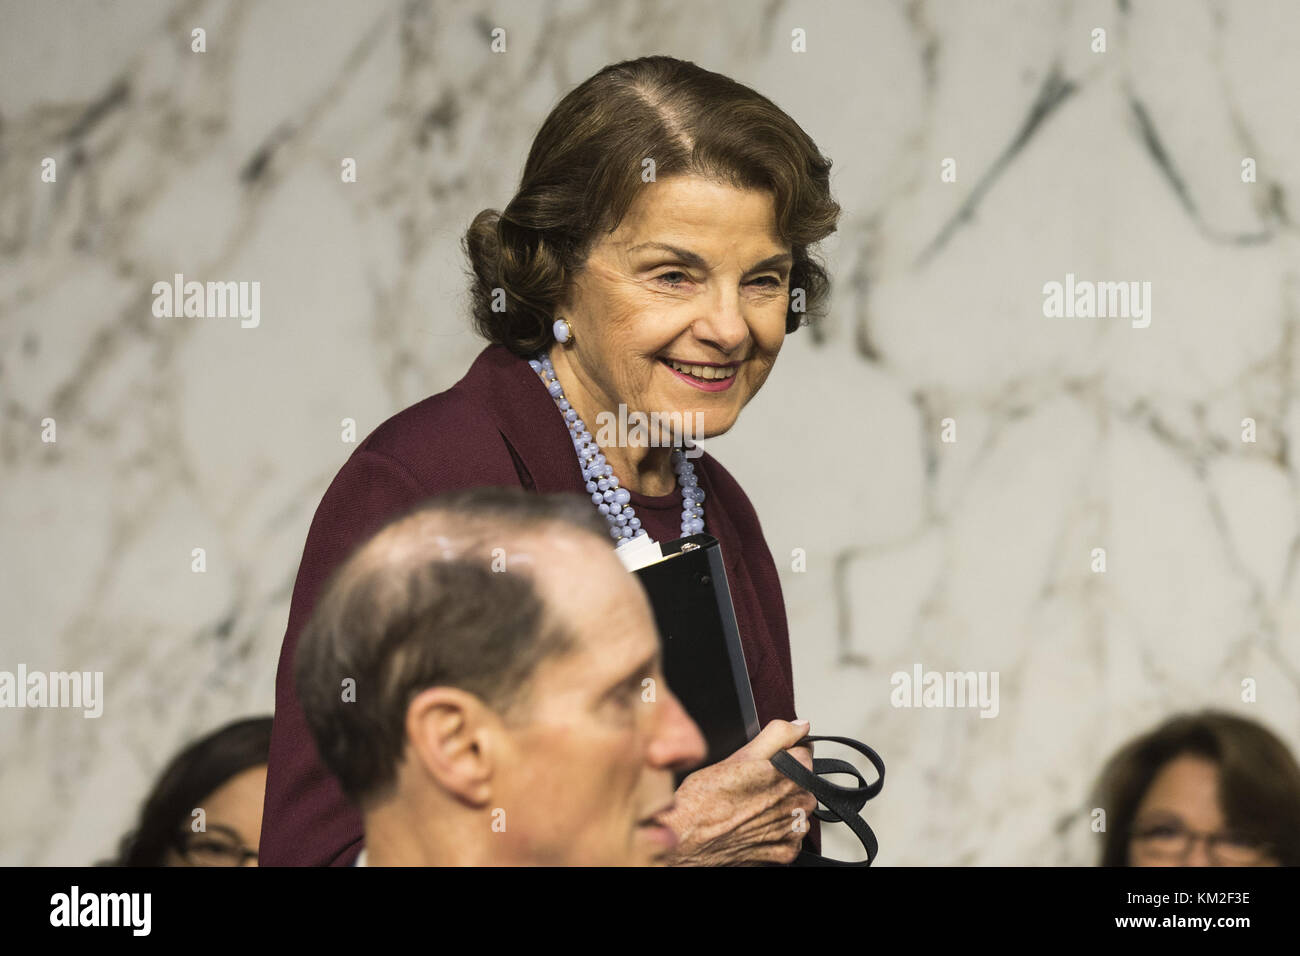 Washington, District Of Columbia, USA. 1st Nov, 2017. United States Senator DIANNE FEINSTEIN, Democrat of California. - Stock Image